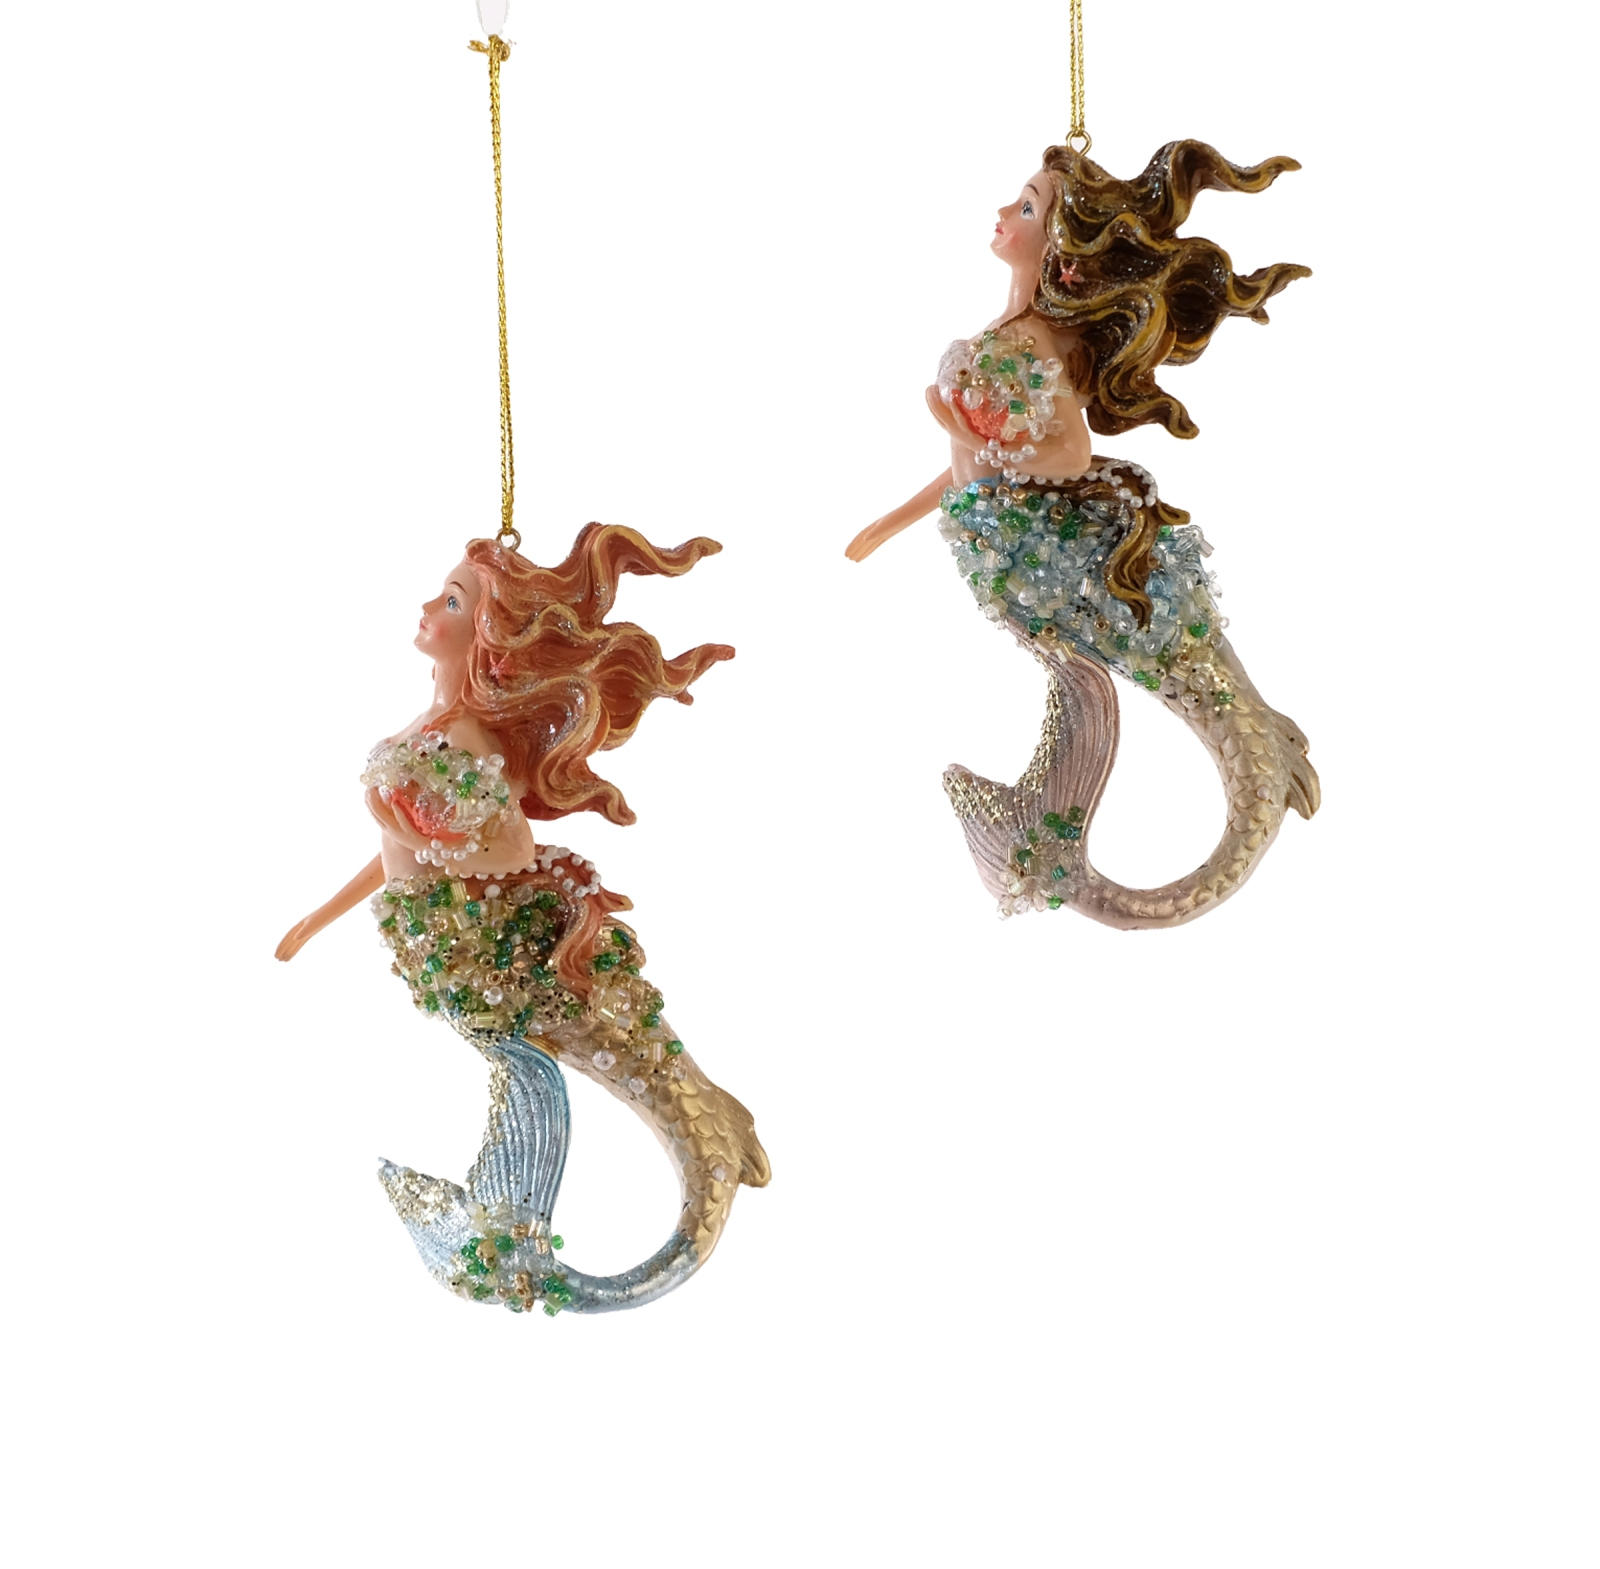 Katherine/'s Mermaids Sea Treasures Christmas Holiday Ornaments Set of 2